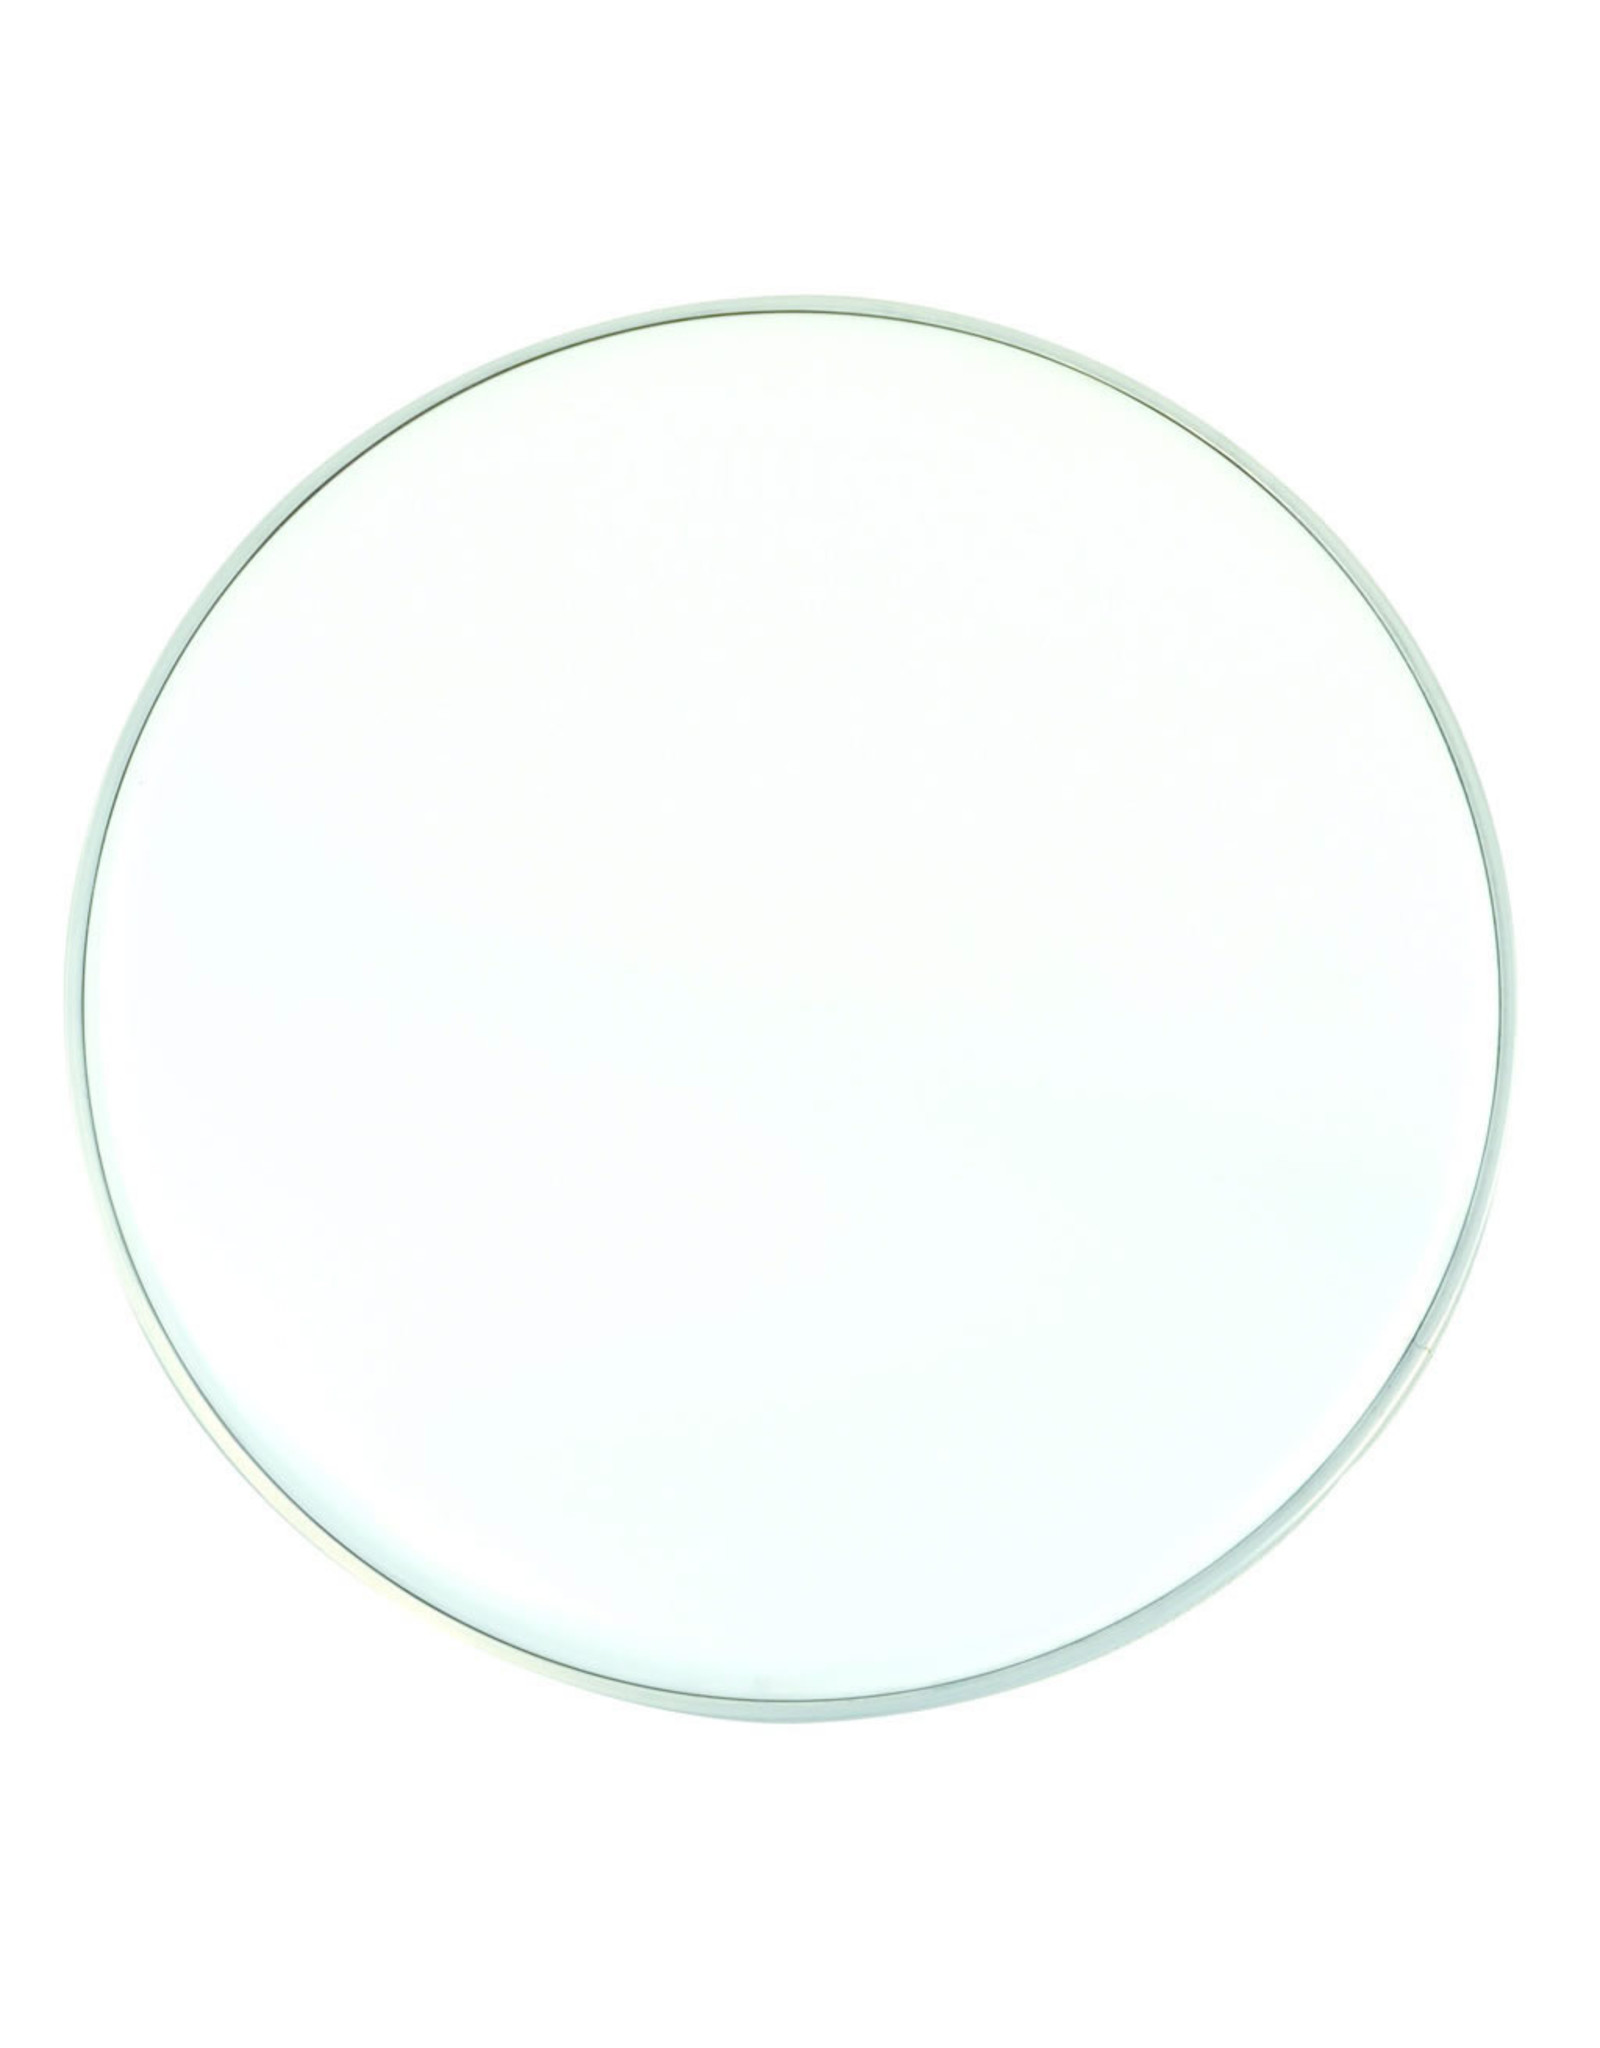 Ramm®  Drumhead 08 Inch   Transparent   Resonance